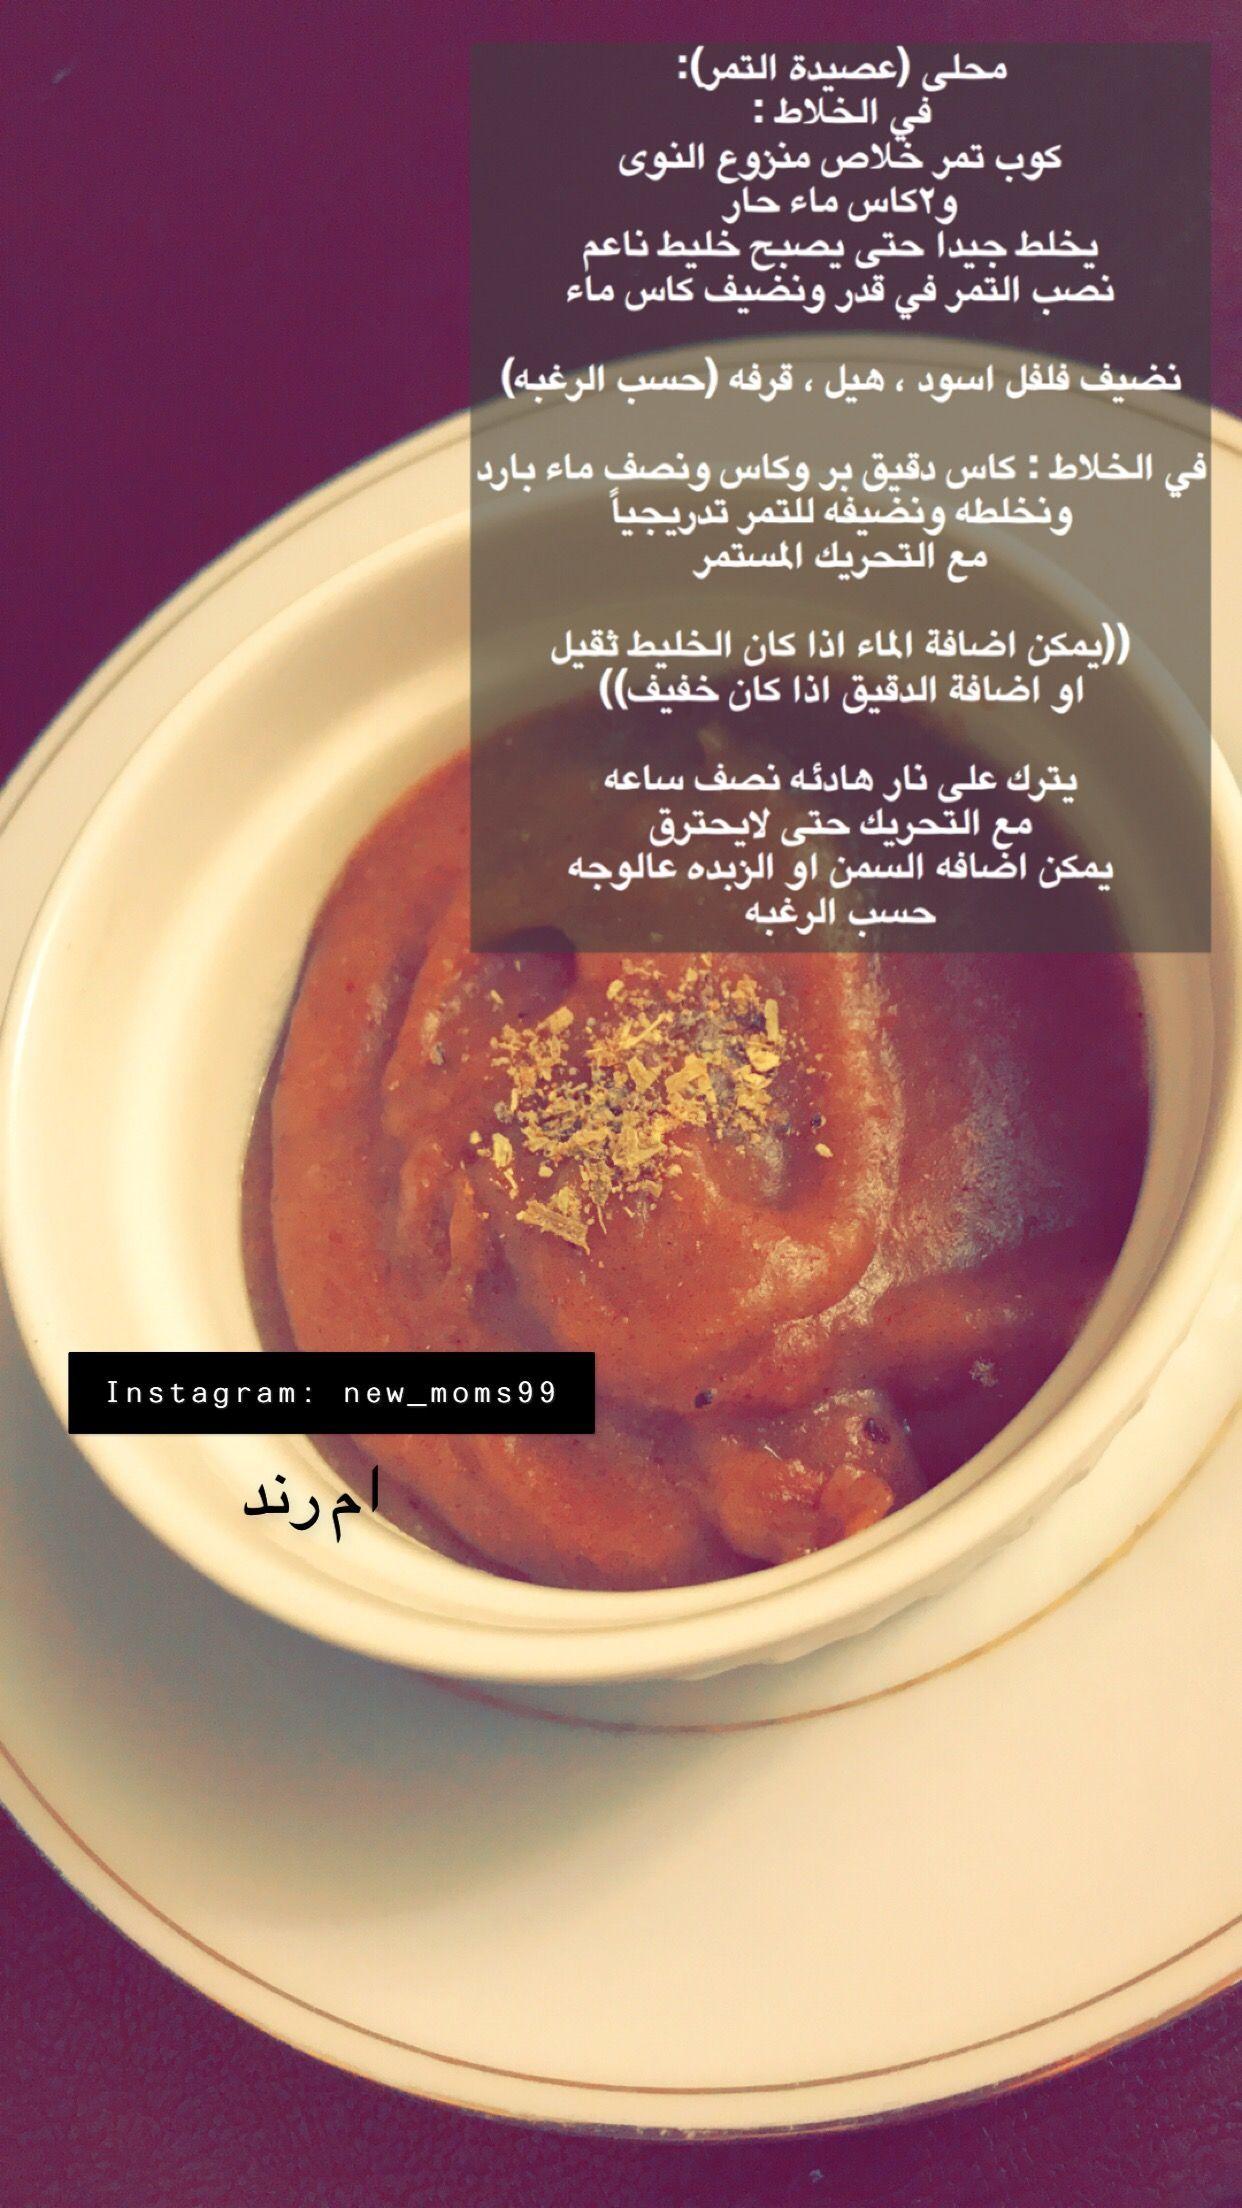 Sweetener Method Porridge Dates Or Rand طريقة المحلى عصيدة التمر ام رند From My Kitchen Or Rand Cooks Th Diy Food Recipes Confectionery Recipes